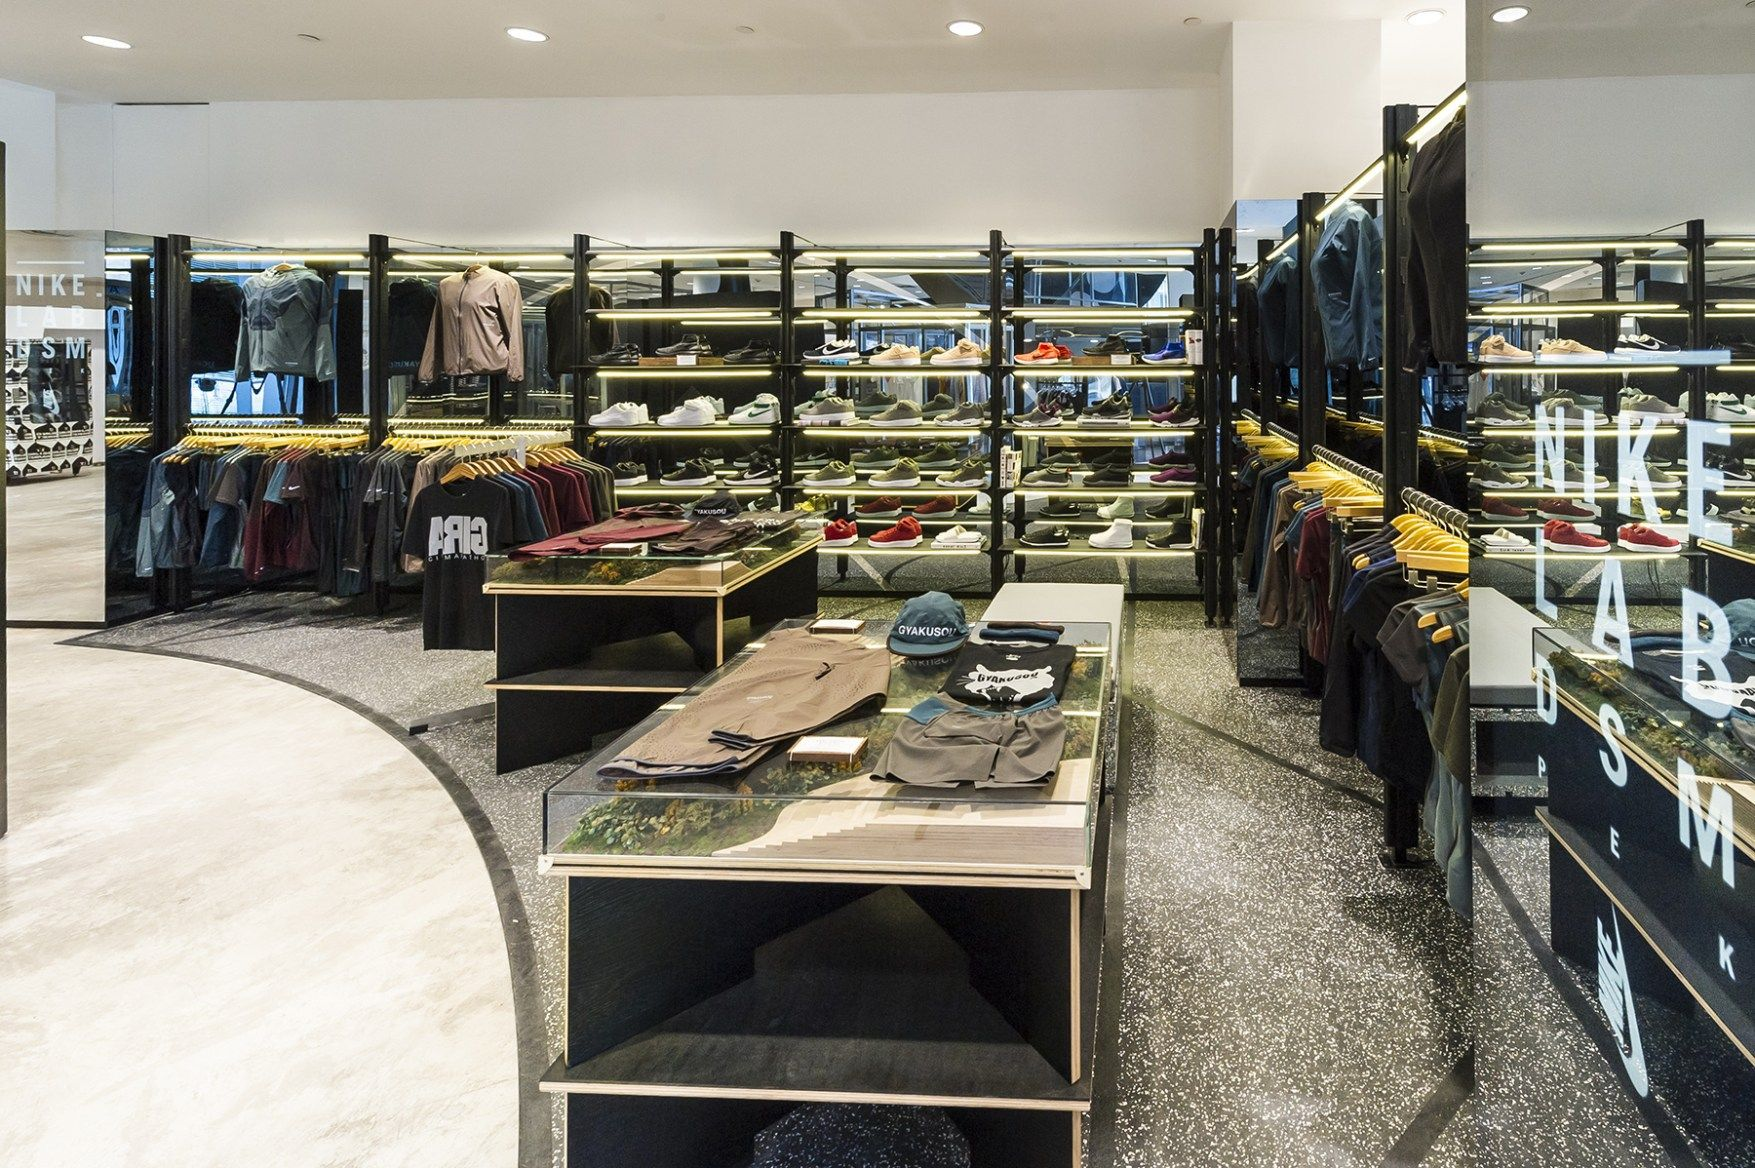 nikelab dsm london snapshot lr | shoe store. | Pinterest | Retail interior  and Interiors